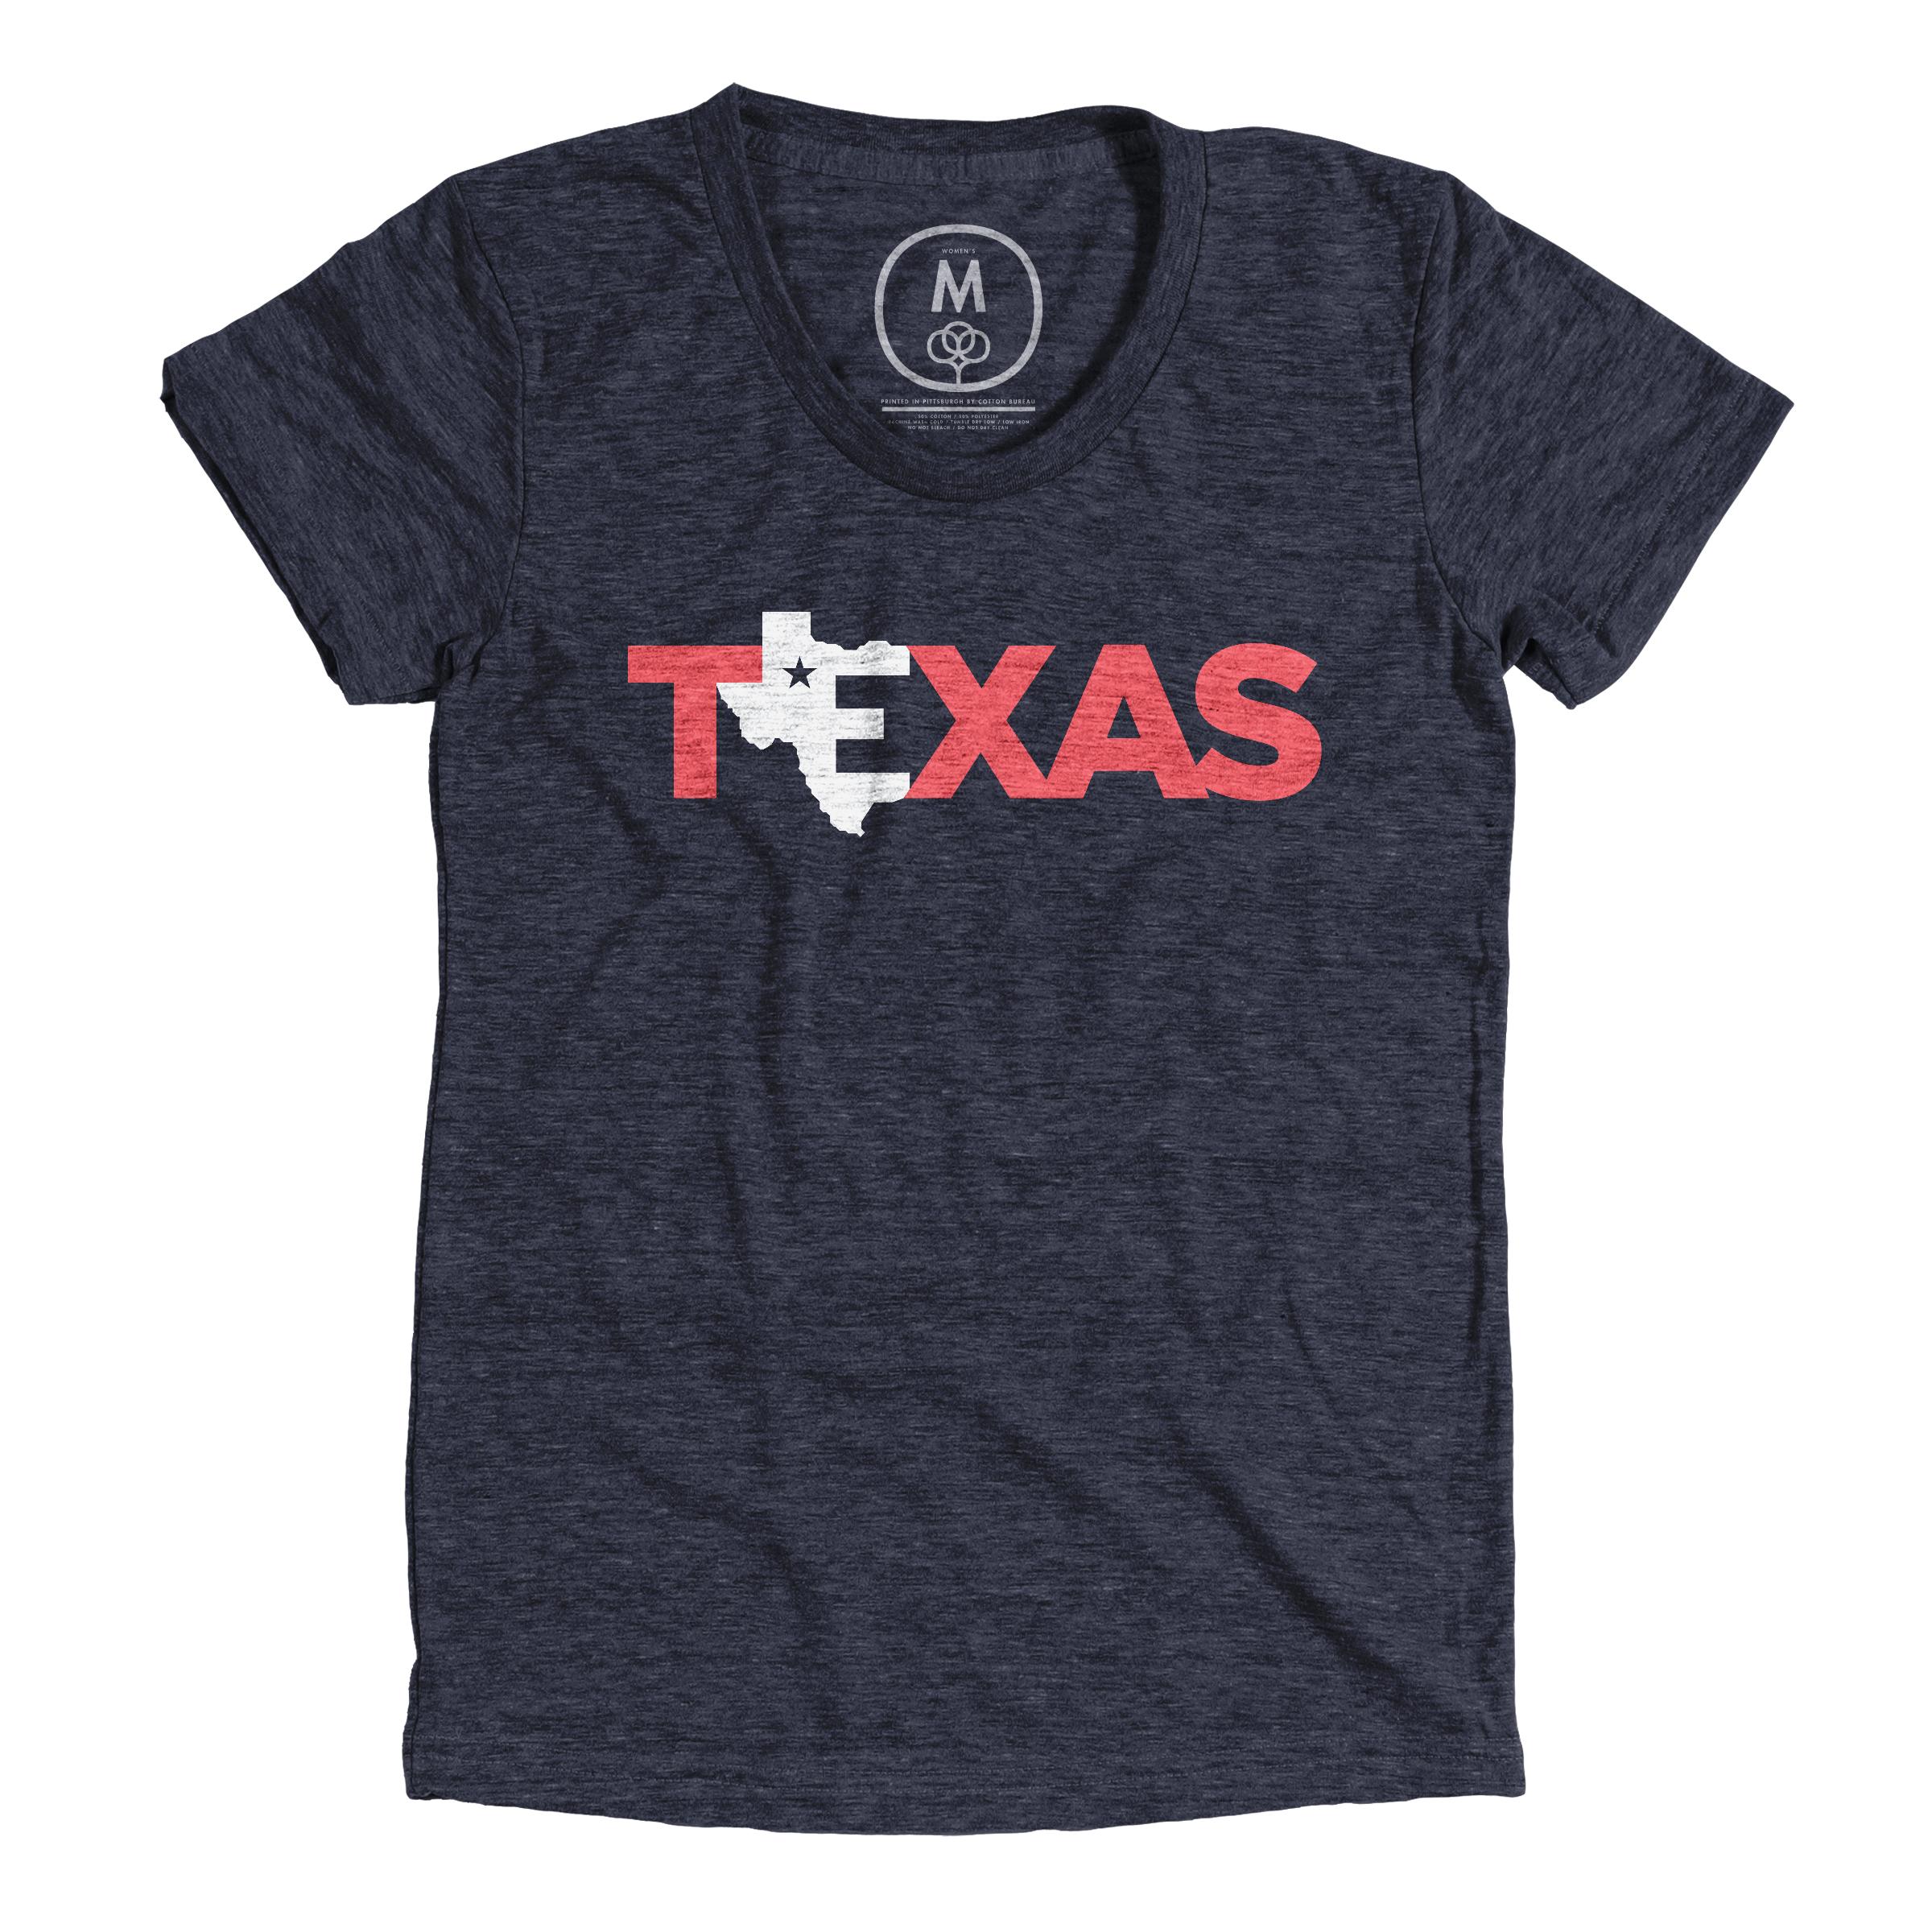 Texas = Home  Vintage Navy (Women's)